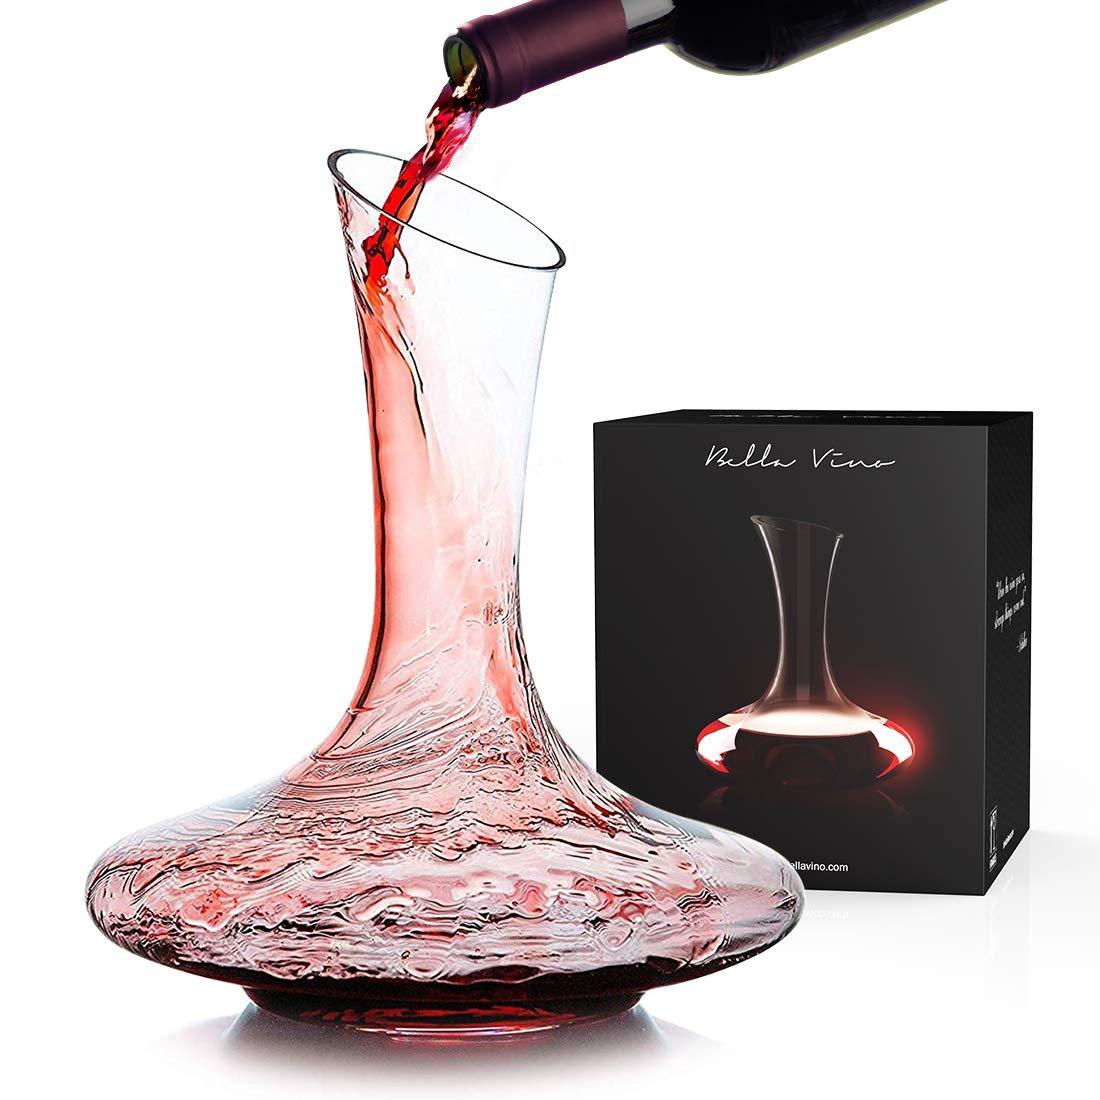 KOIOS Wine Decanter-100% Hand Blown Lead-Free crystal Glass Wine Decanter, Red Wine Carafe, Wine Accessories, Wine Gift (1200ml)